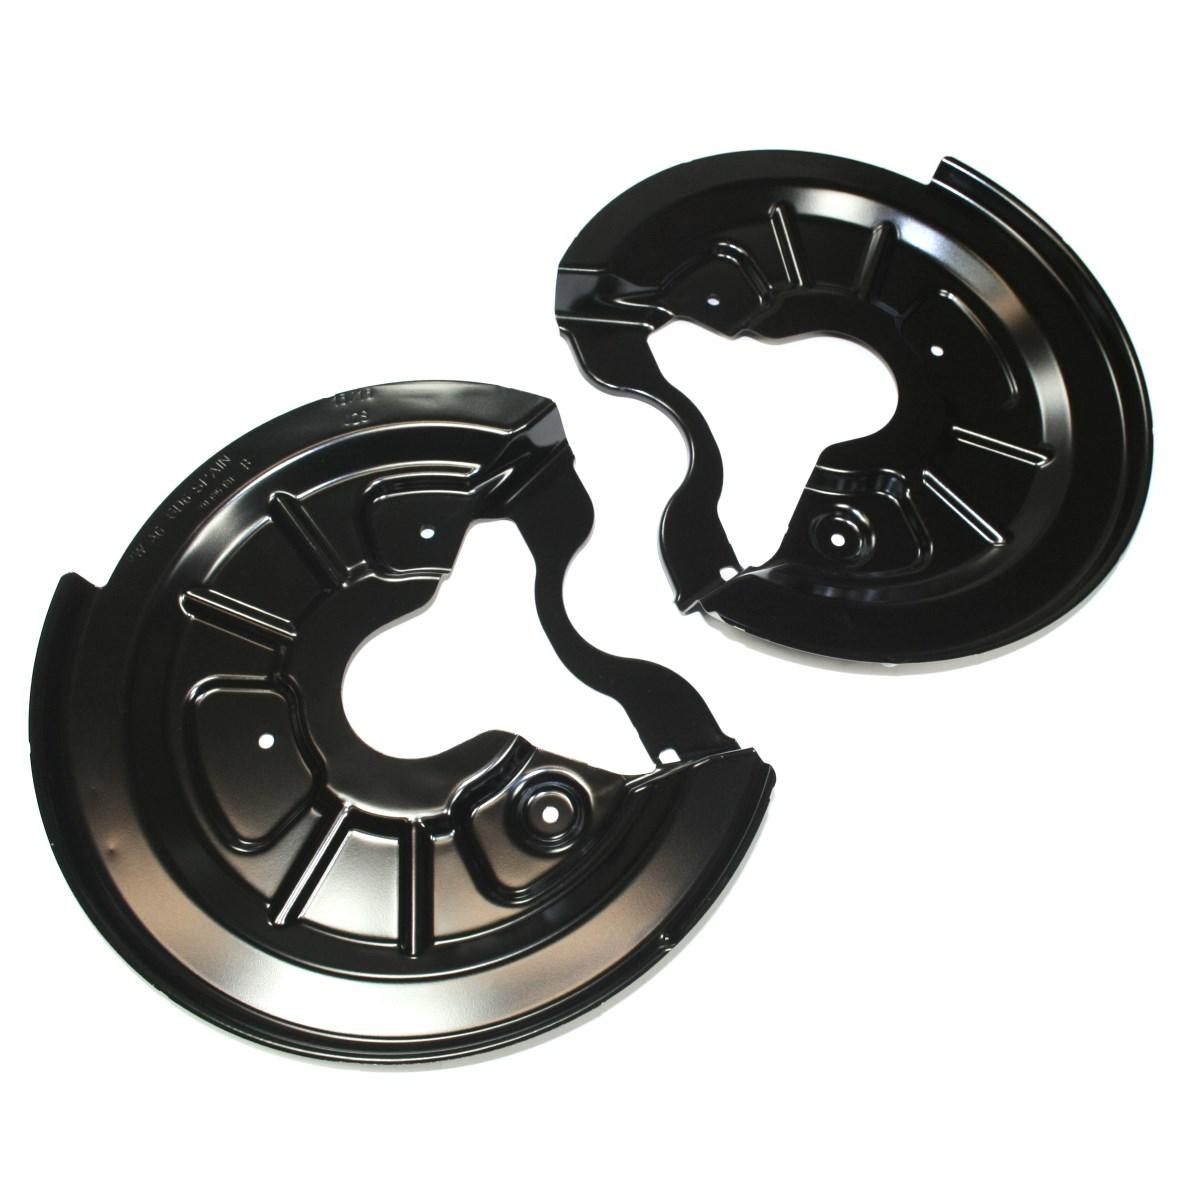 bremsenblech deckblech bremsscheiben original vw bremsen. Black Bedroom Furniture Sets. Home Design Ideas